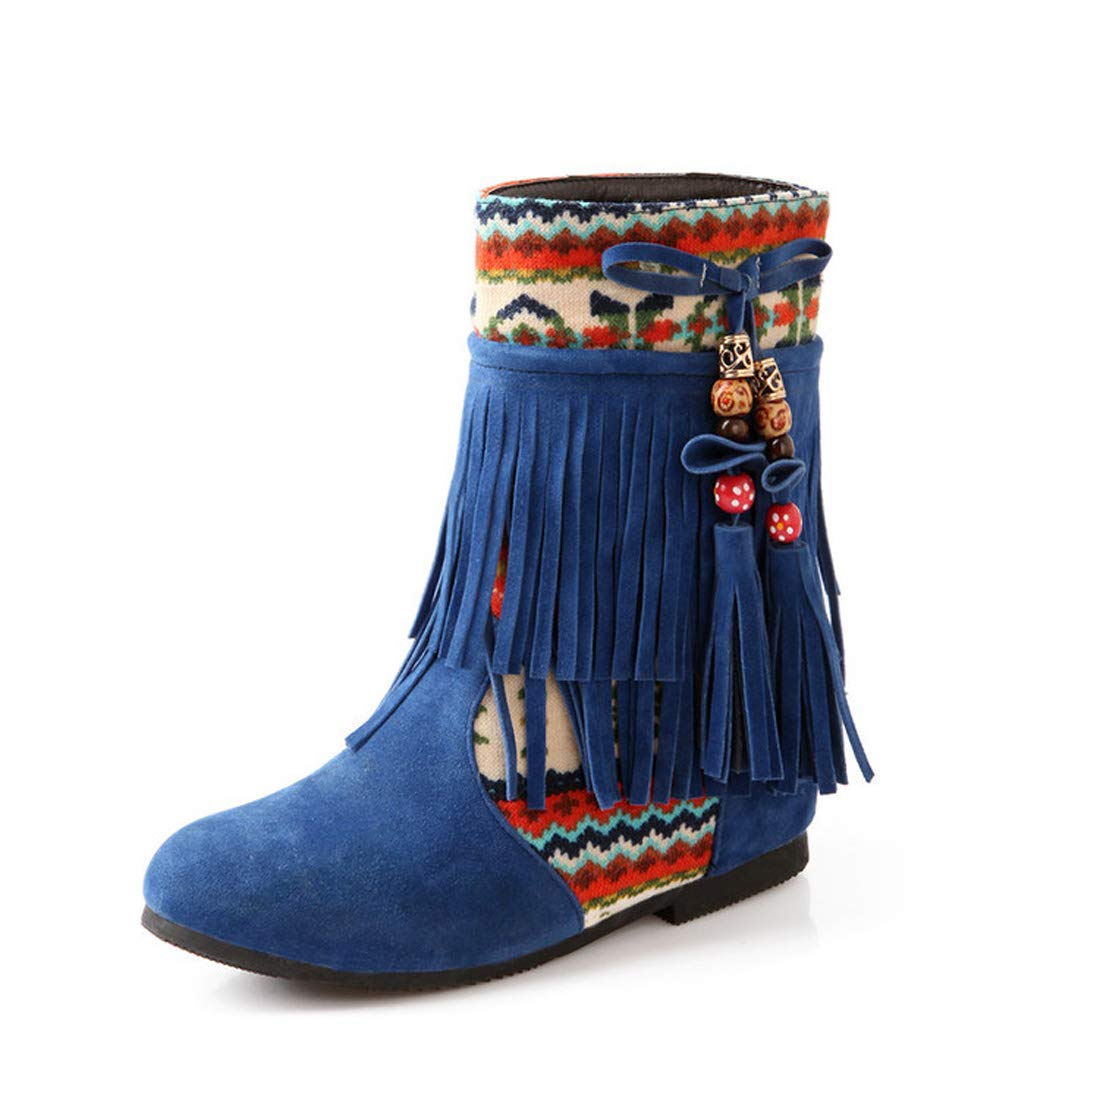 DANDANJIE Damen Schuhe Ankle Stiefel Bohemia Quaste unsichtbare Ferse Perlen Stiefel große Größe